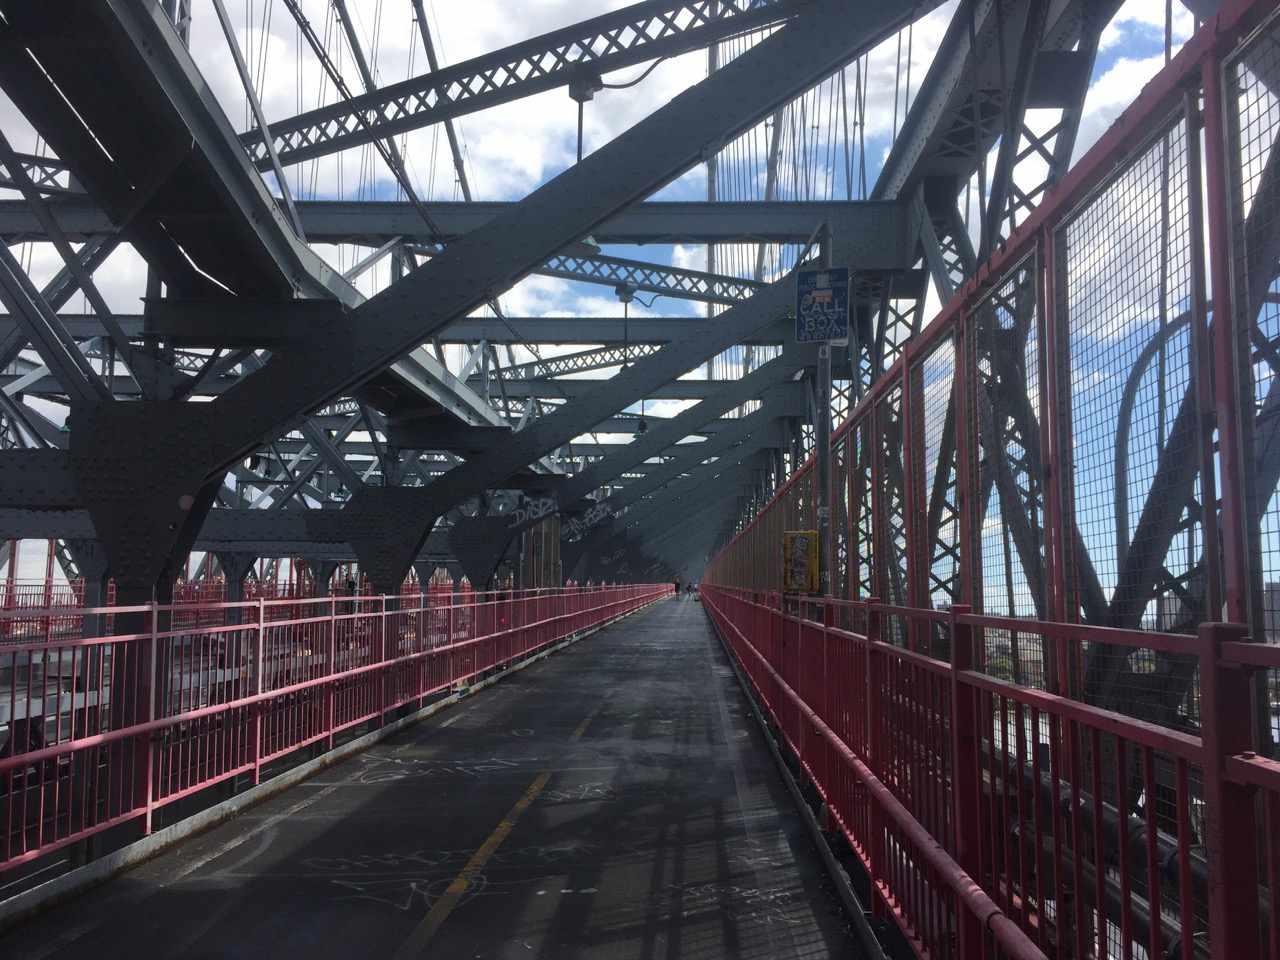 walking the Williamsburg Bridge